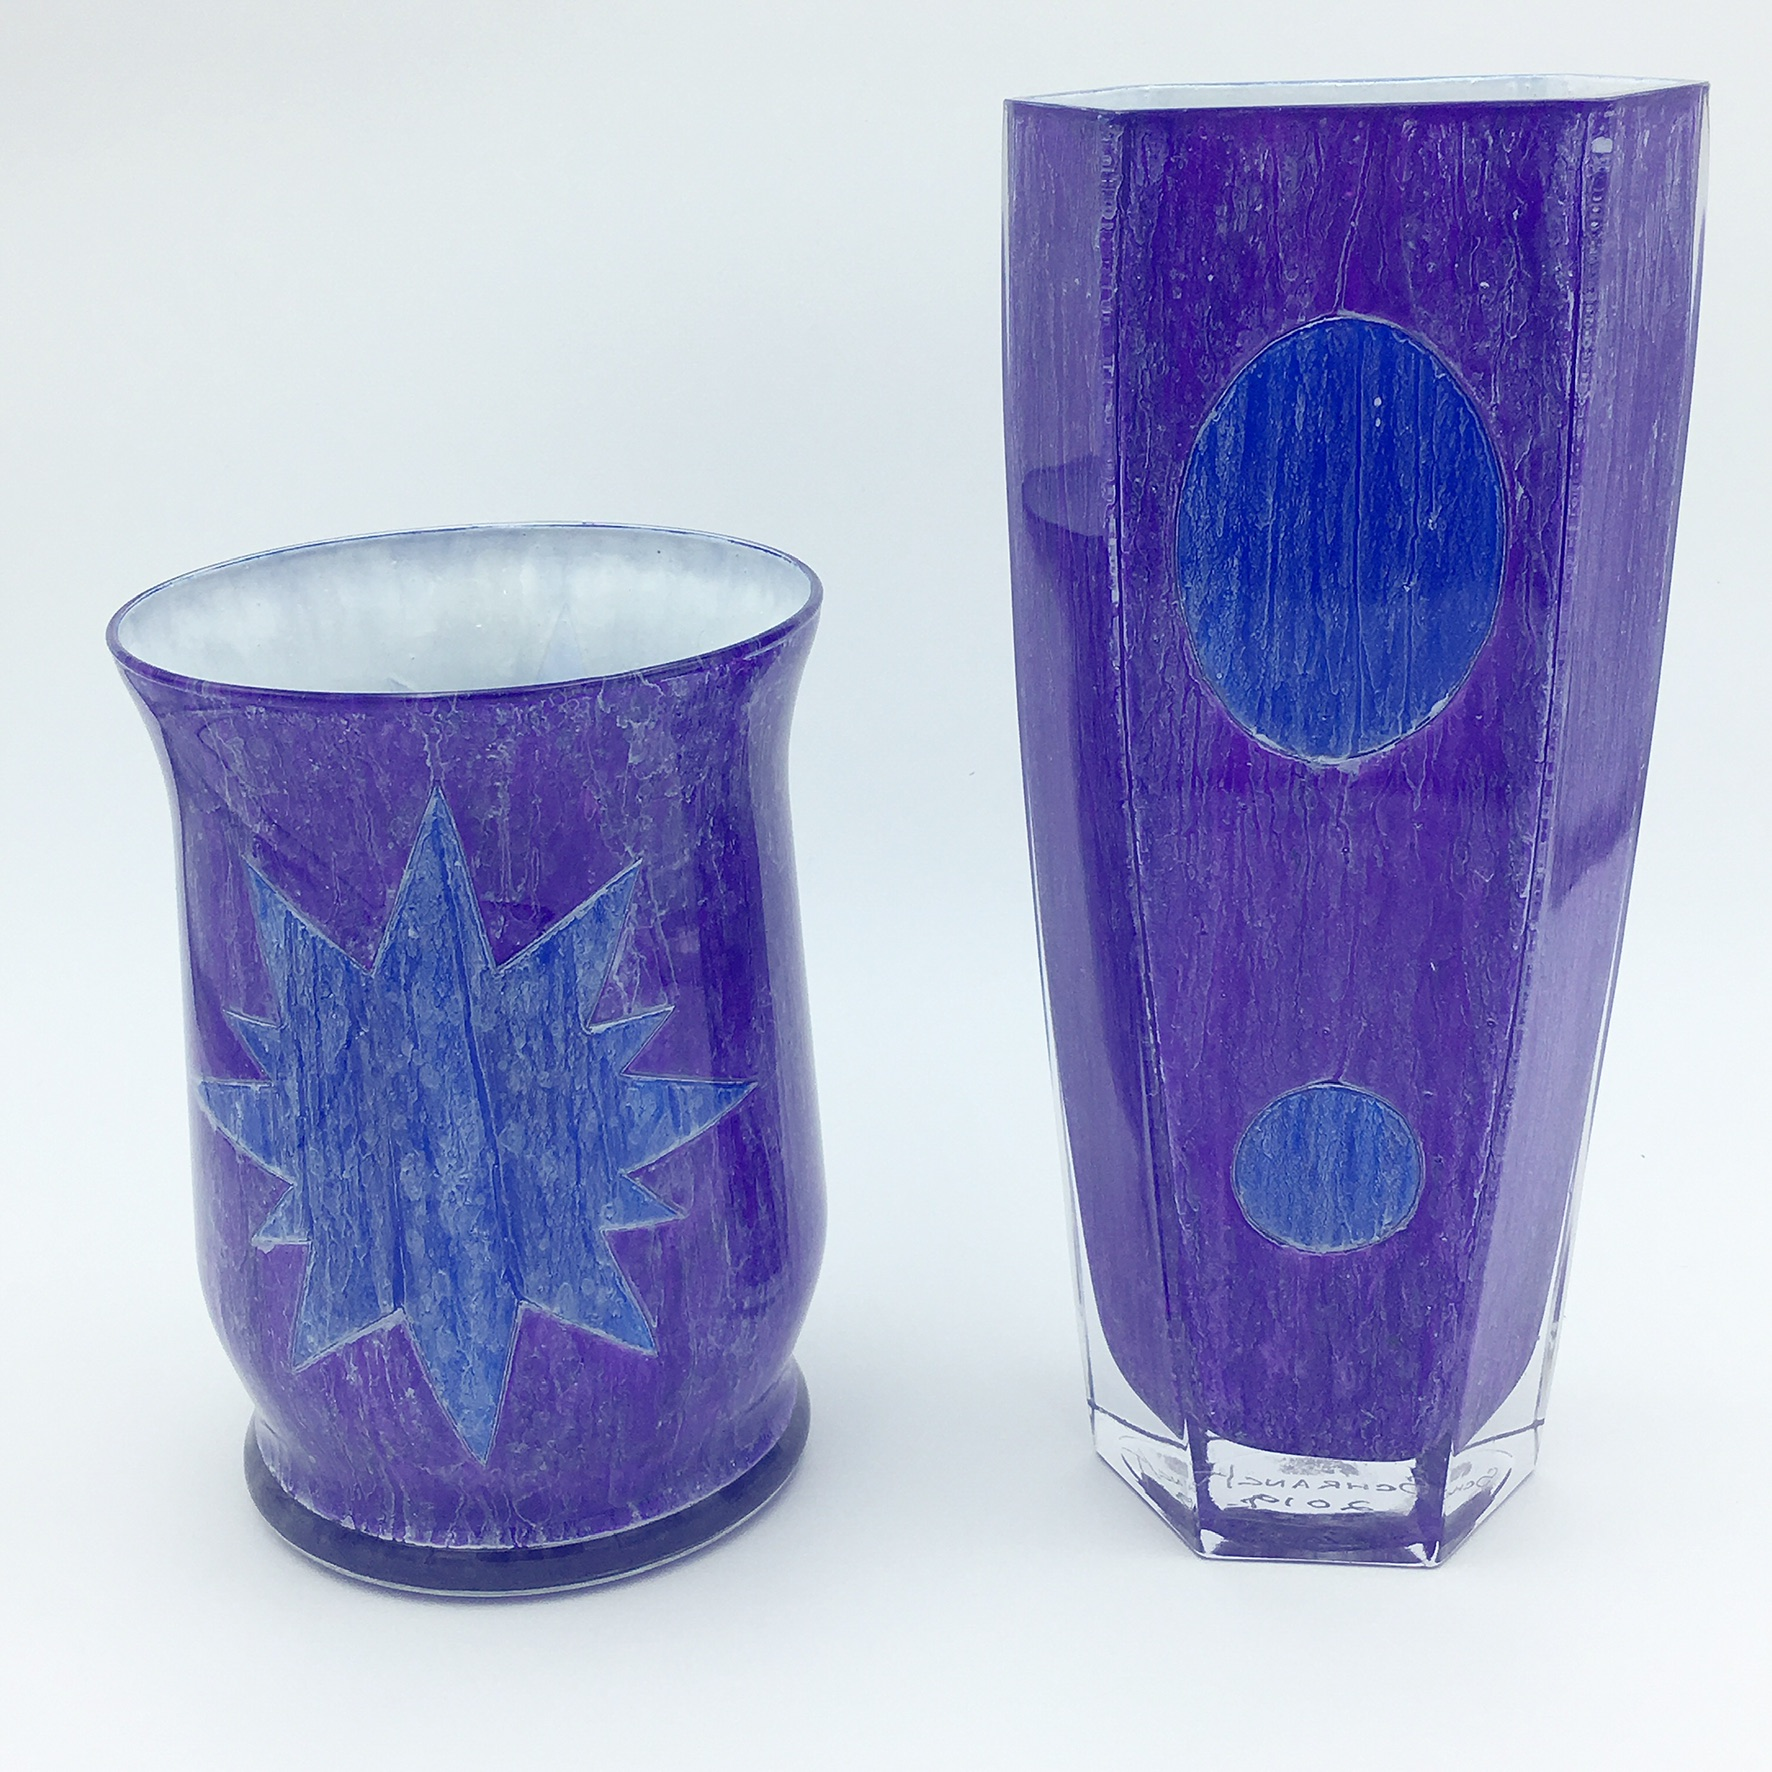 cjs-violet-blue-vases-handpaintedglass